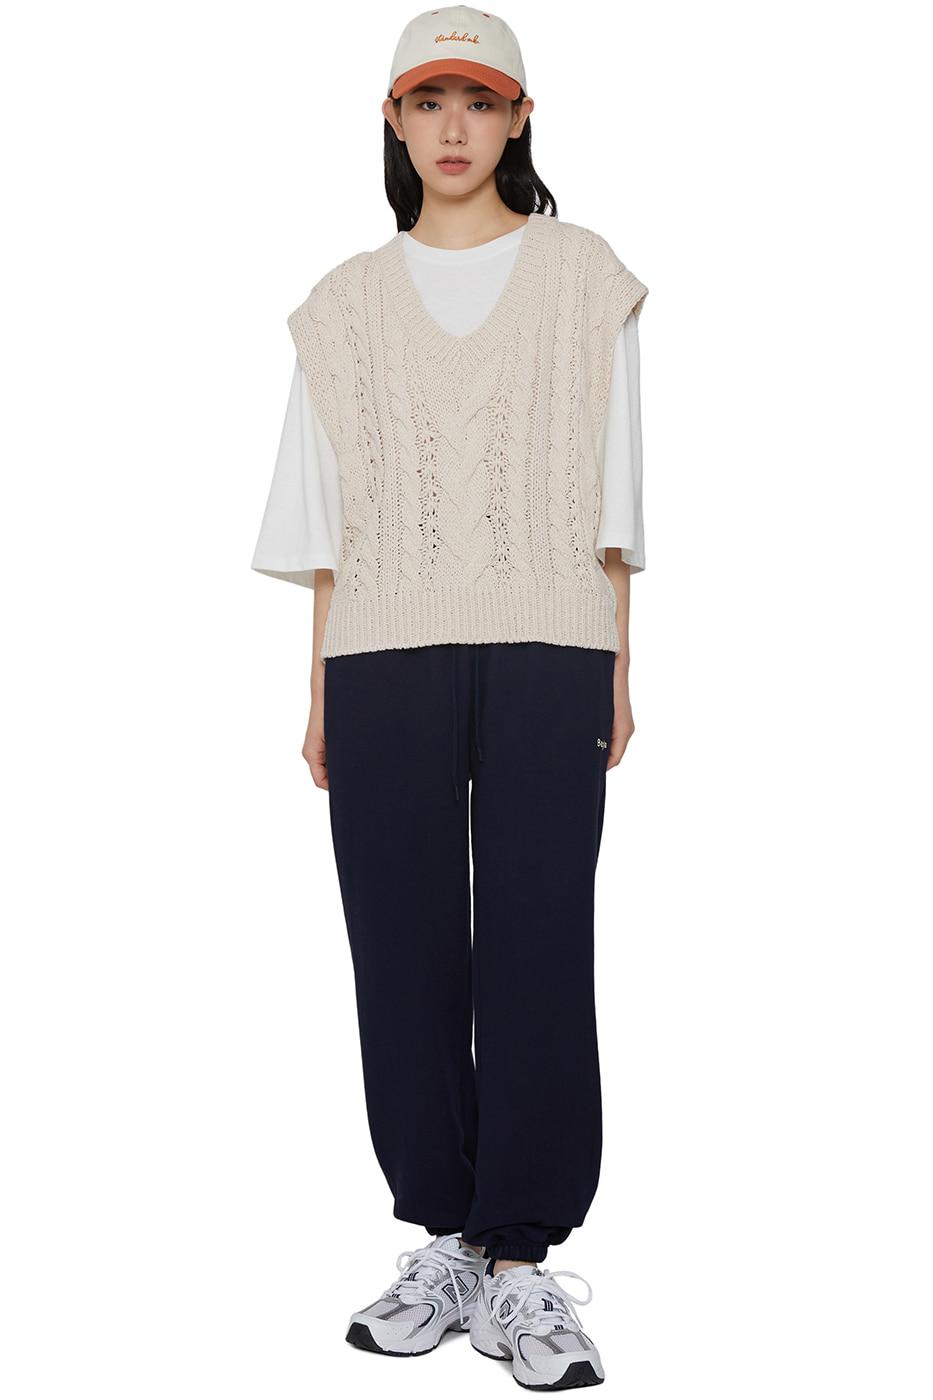 Humming Twist Knitwear Vest